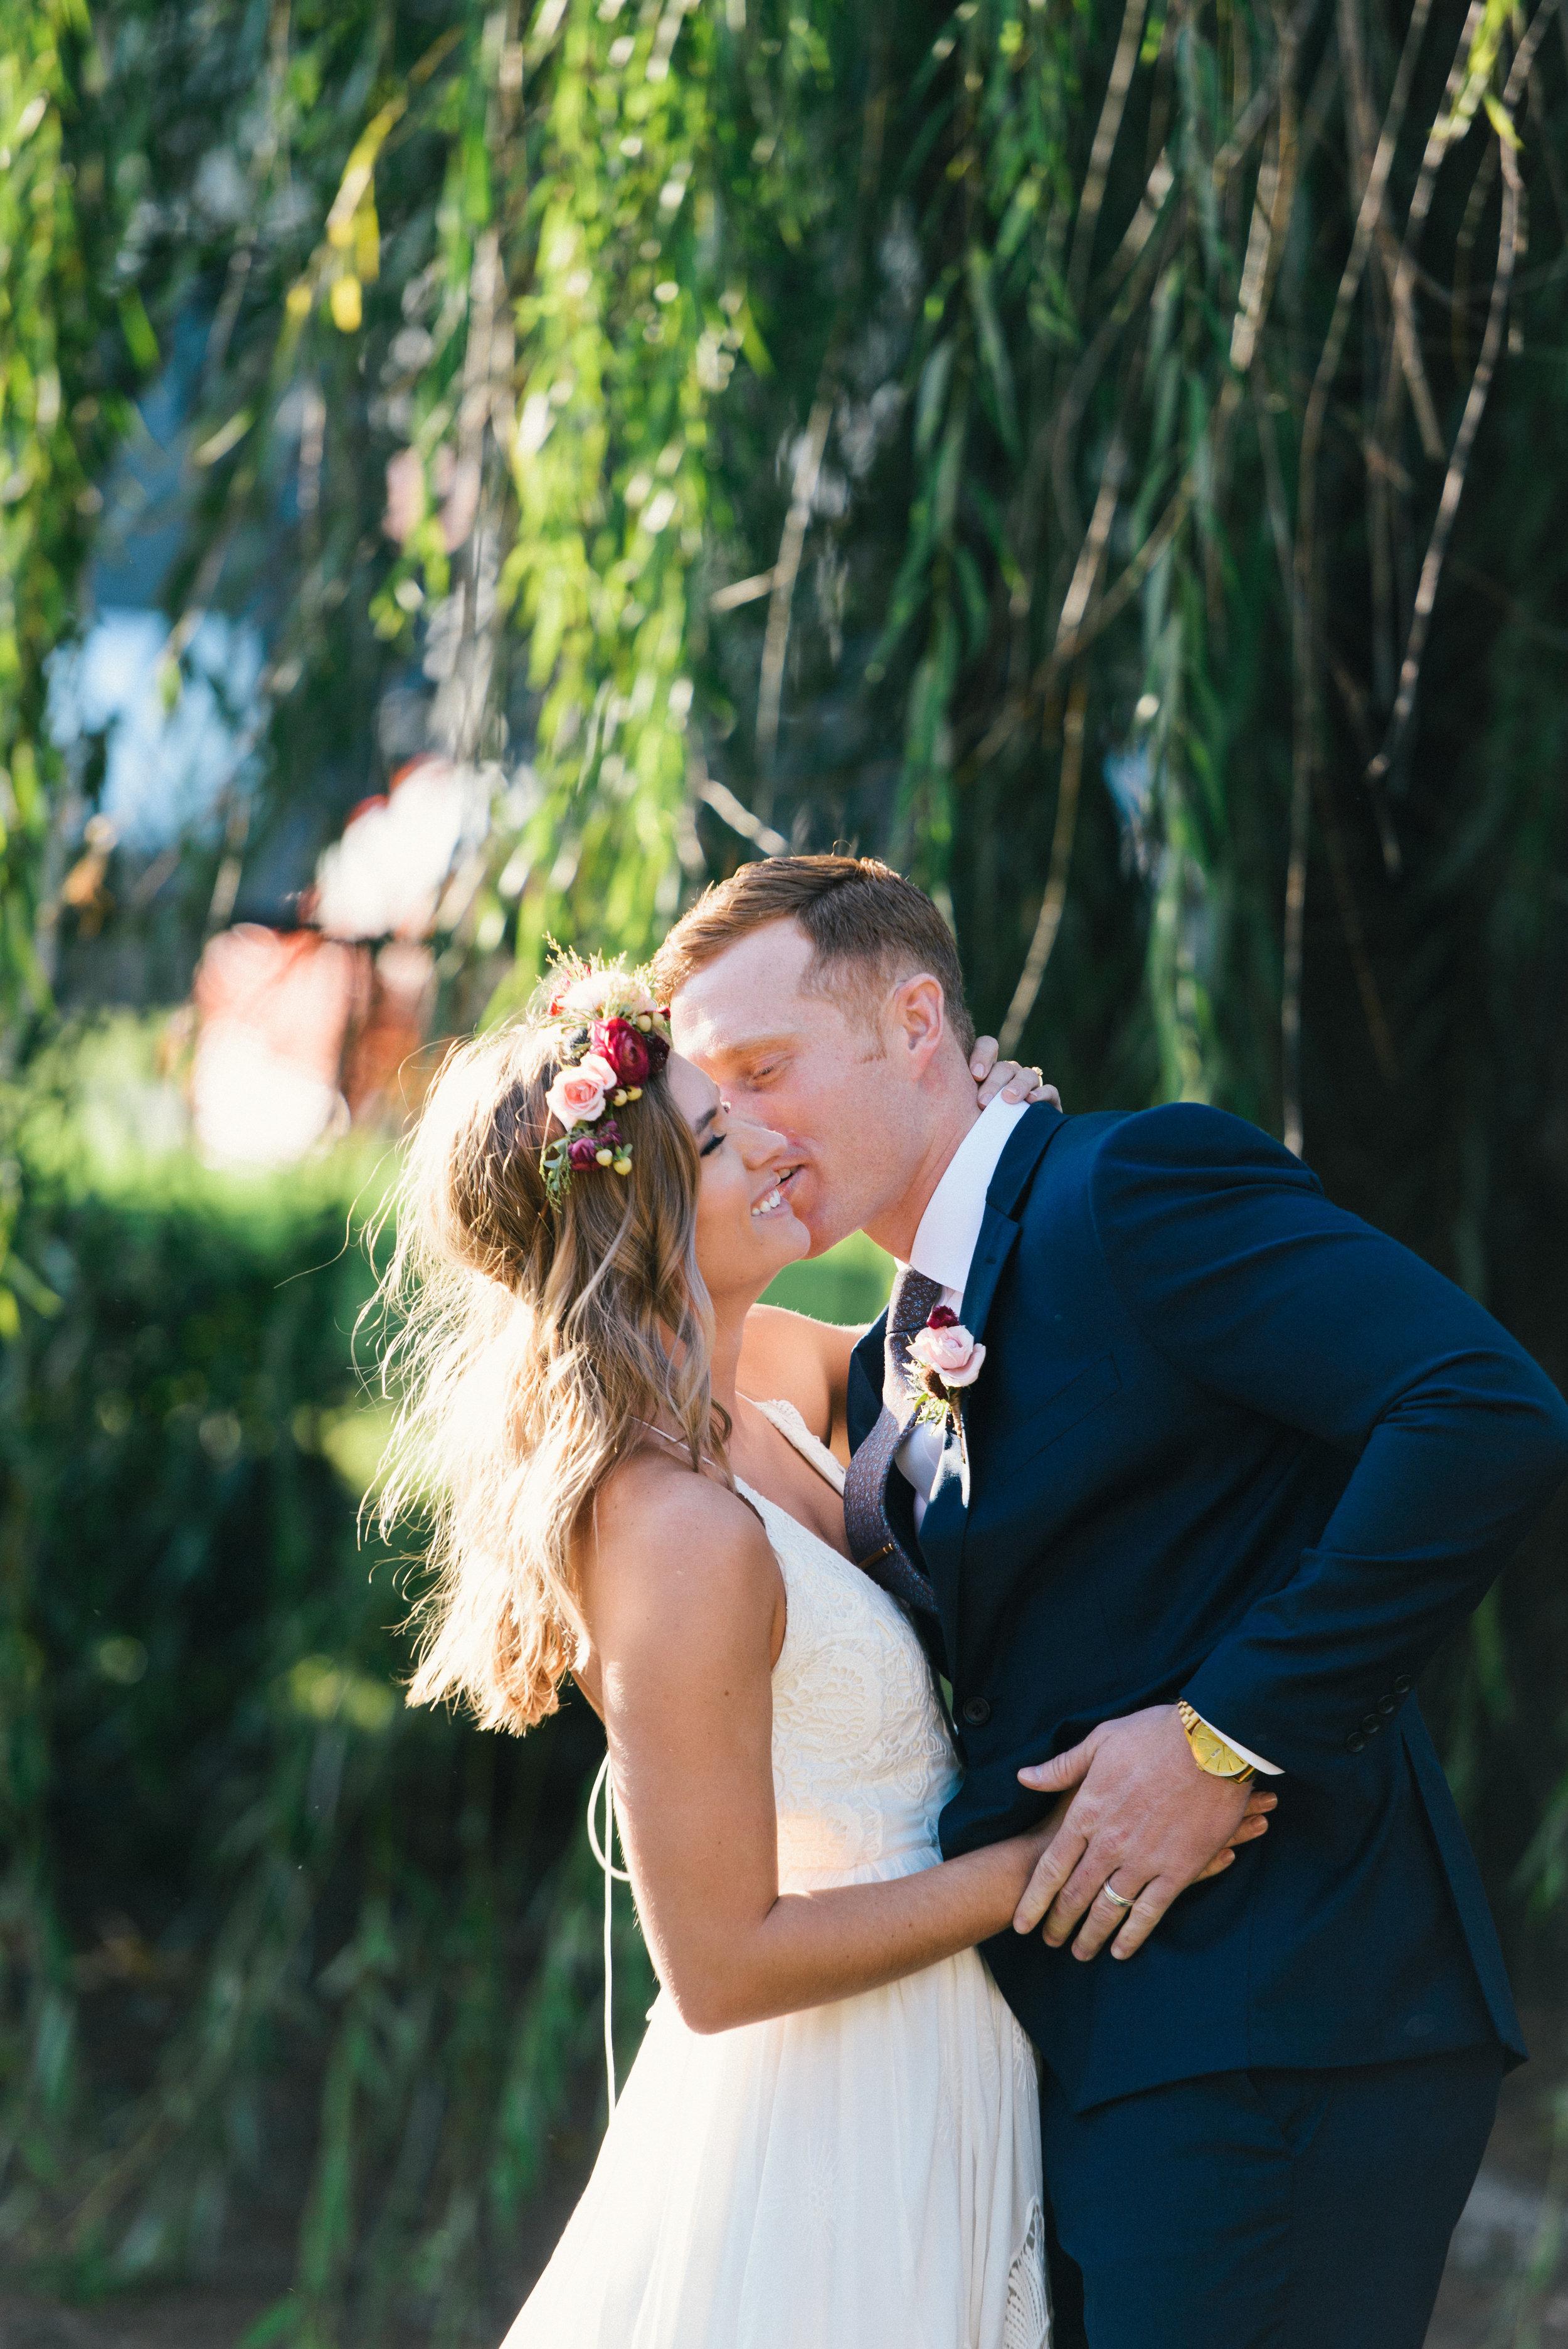 kristin-and-peter-atlanta-georgia-wedding-october-8th-2016 (451 of 1068).jpg